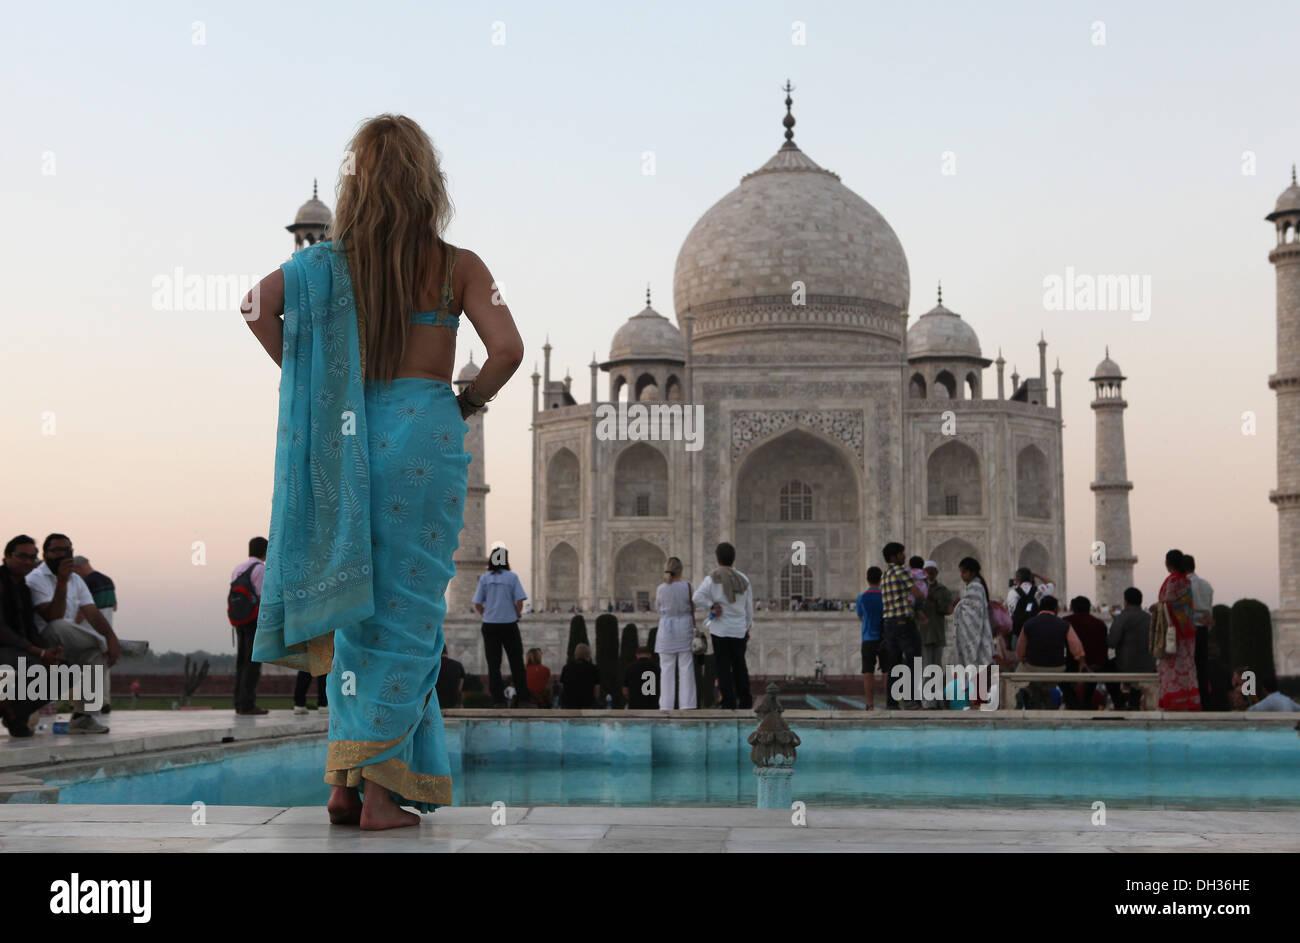 I turisti di fronte al Taj Mahal, Agra, Uttar Pradesh, India, Asia Immagini Stock